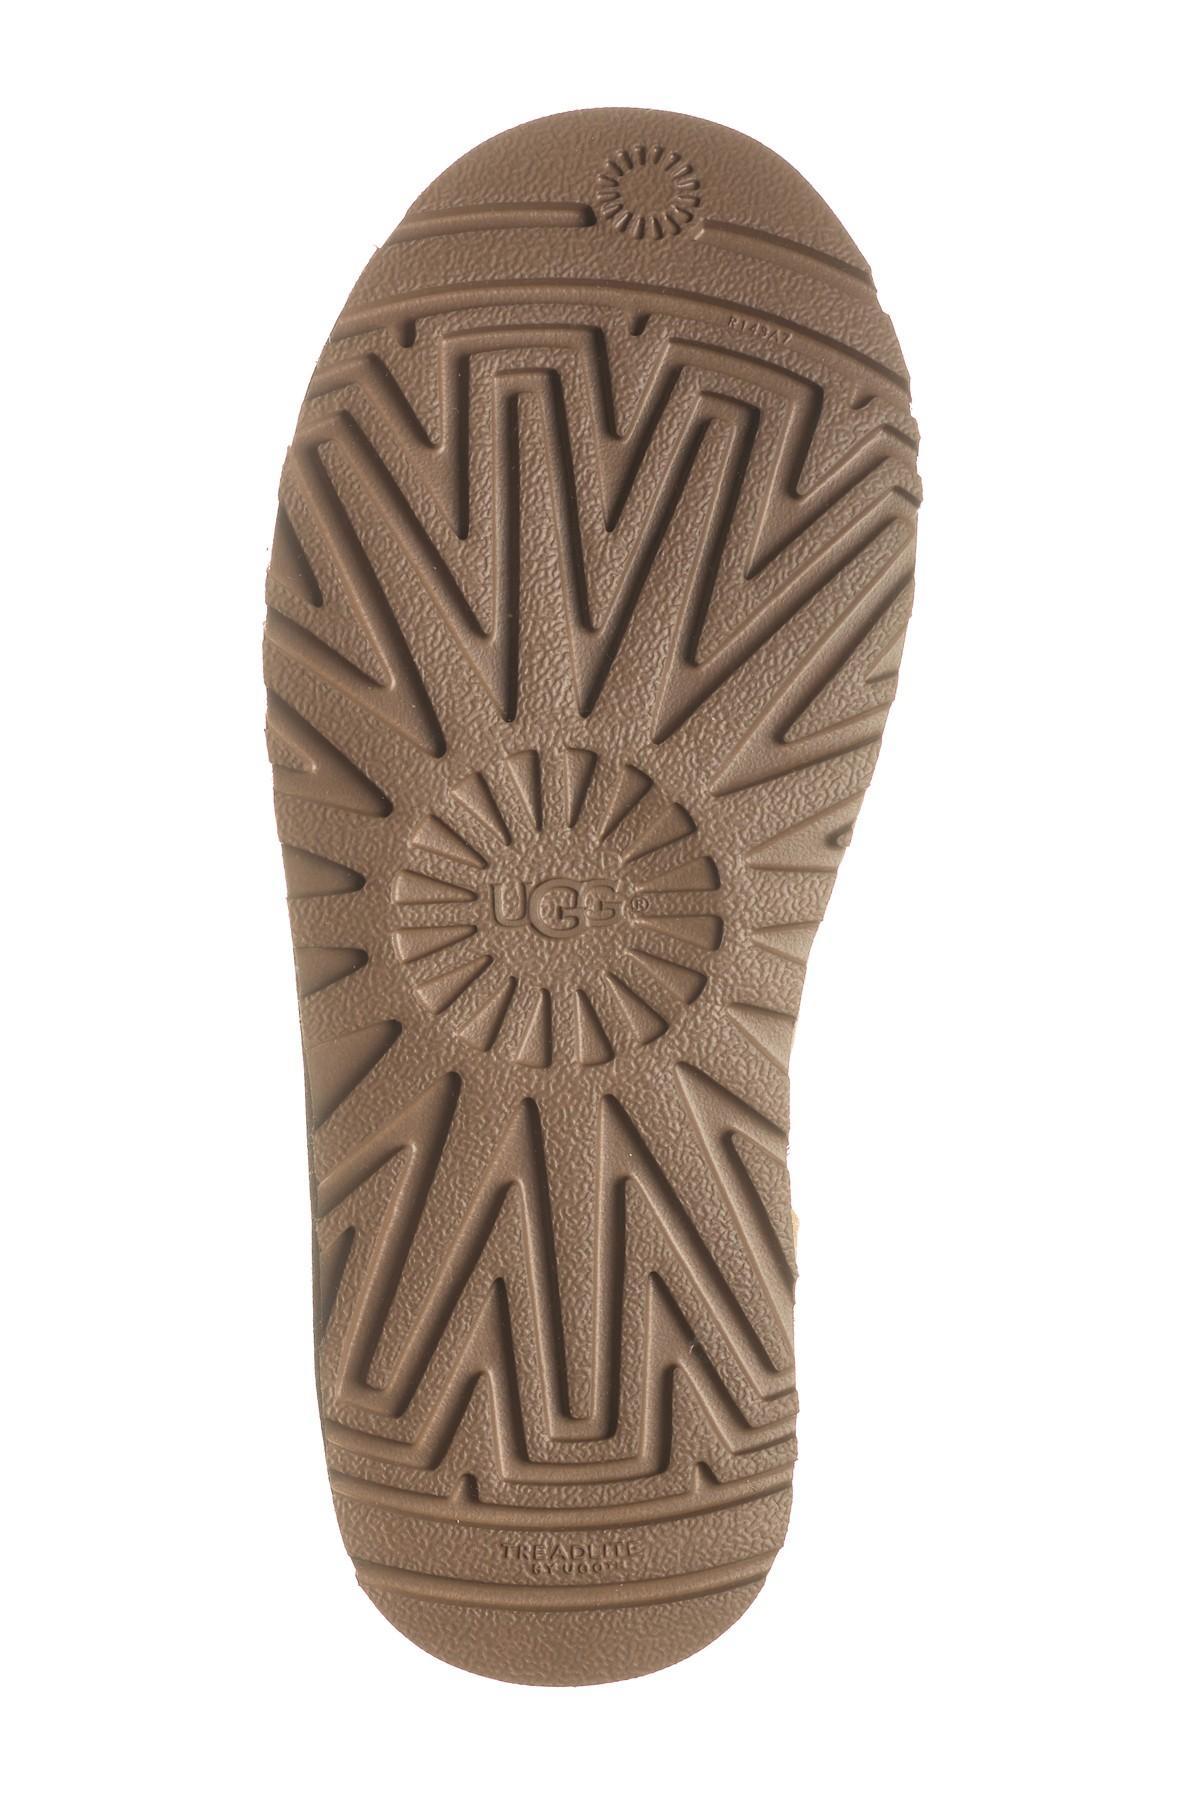 03d0b646ae1 Ugg Natural Saela Rib-knit Cuff Pure(tm) Lined Boot